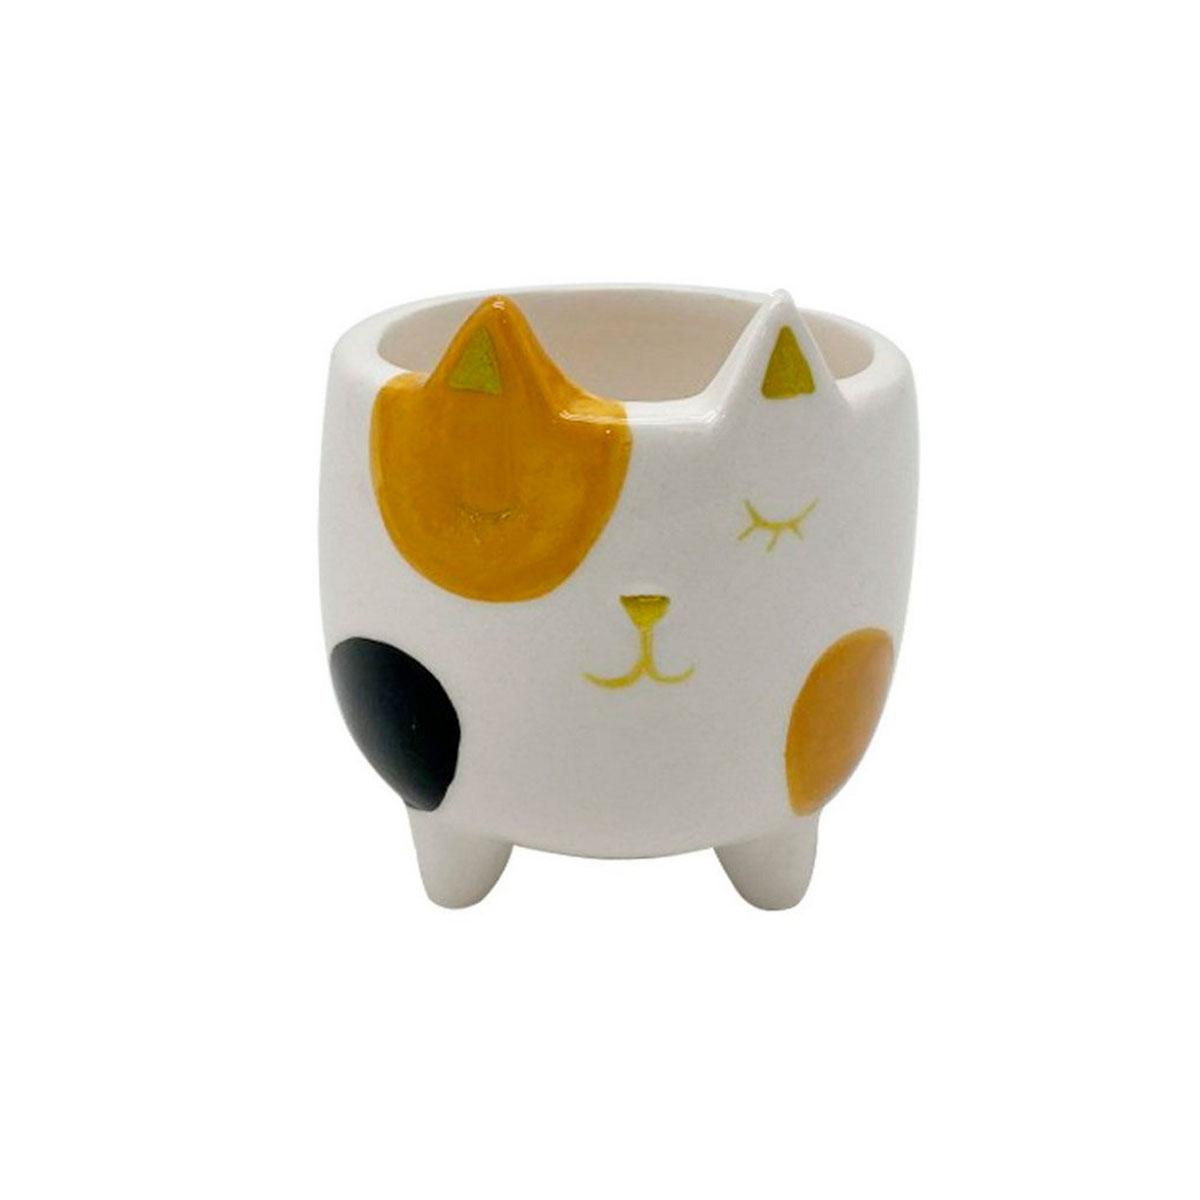 Cachepot Vaso Decorativo de Cerâmica Gato Malhado - Presente Super